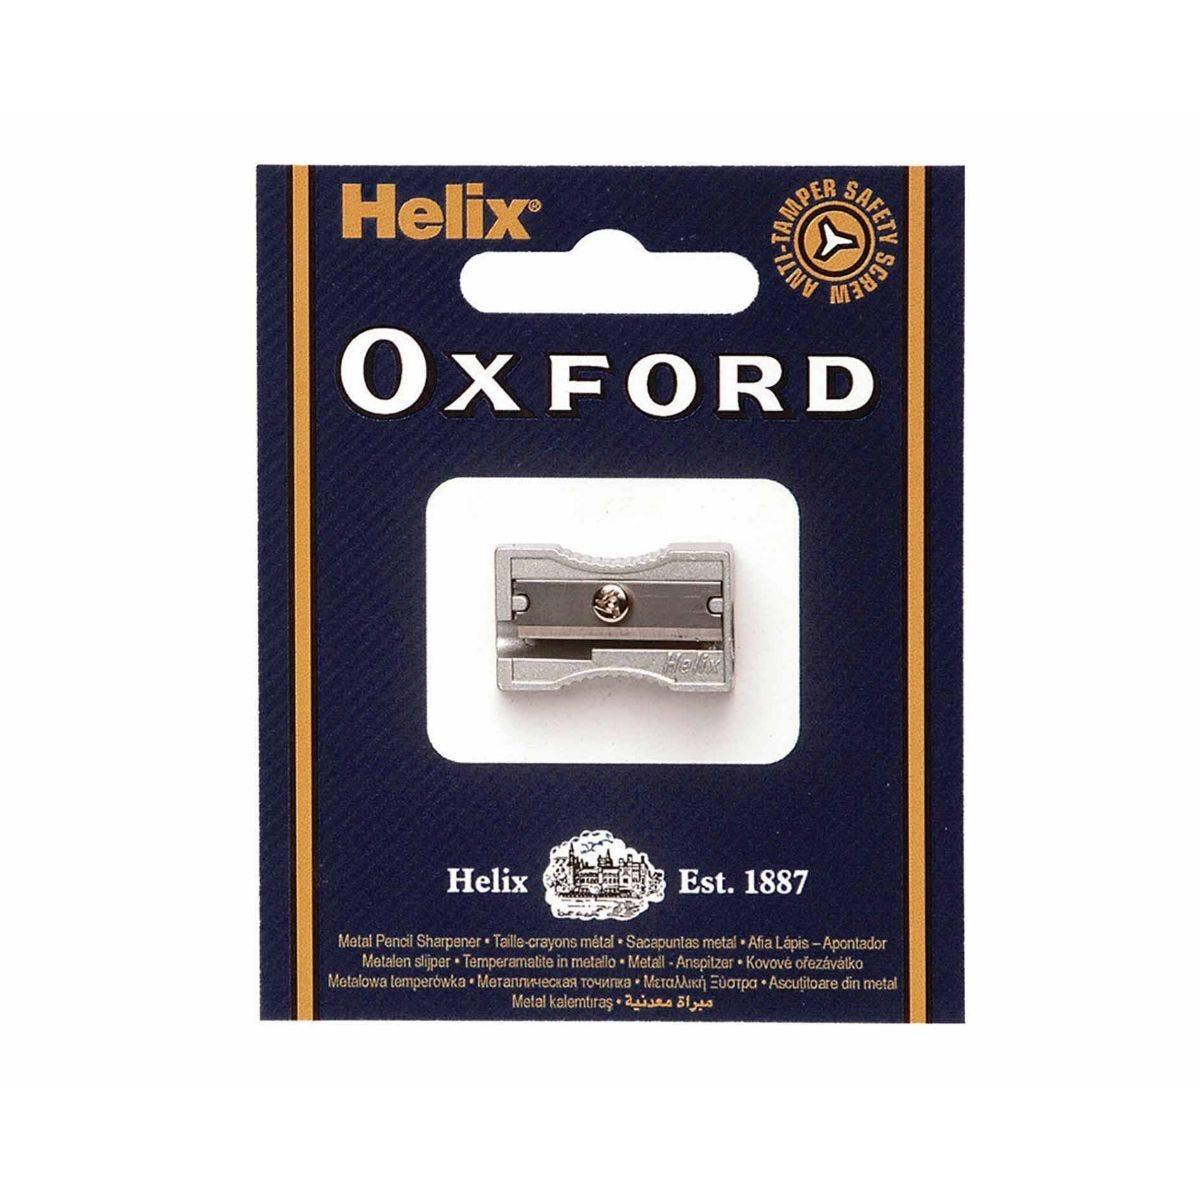 Helix Oxford Metal Pencil Sharpener Single Hole